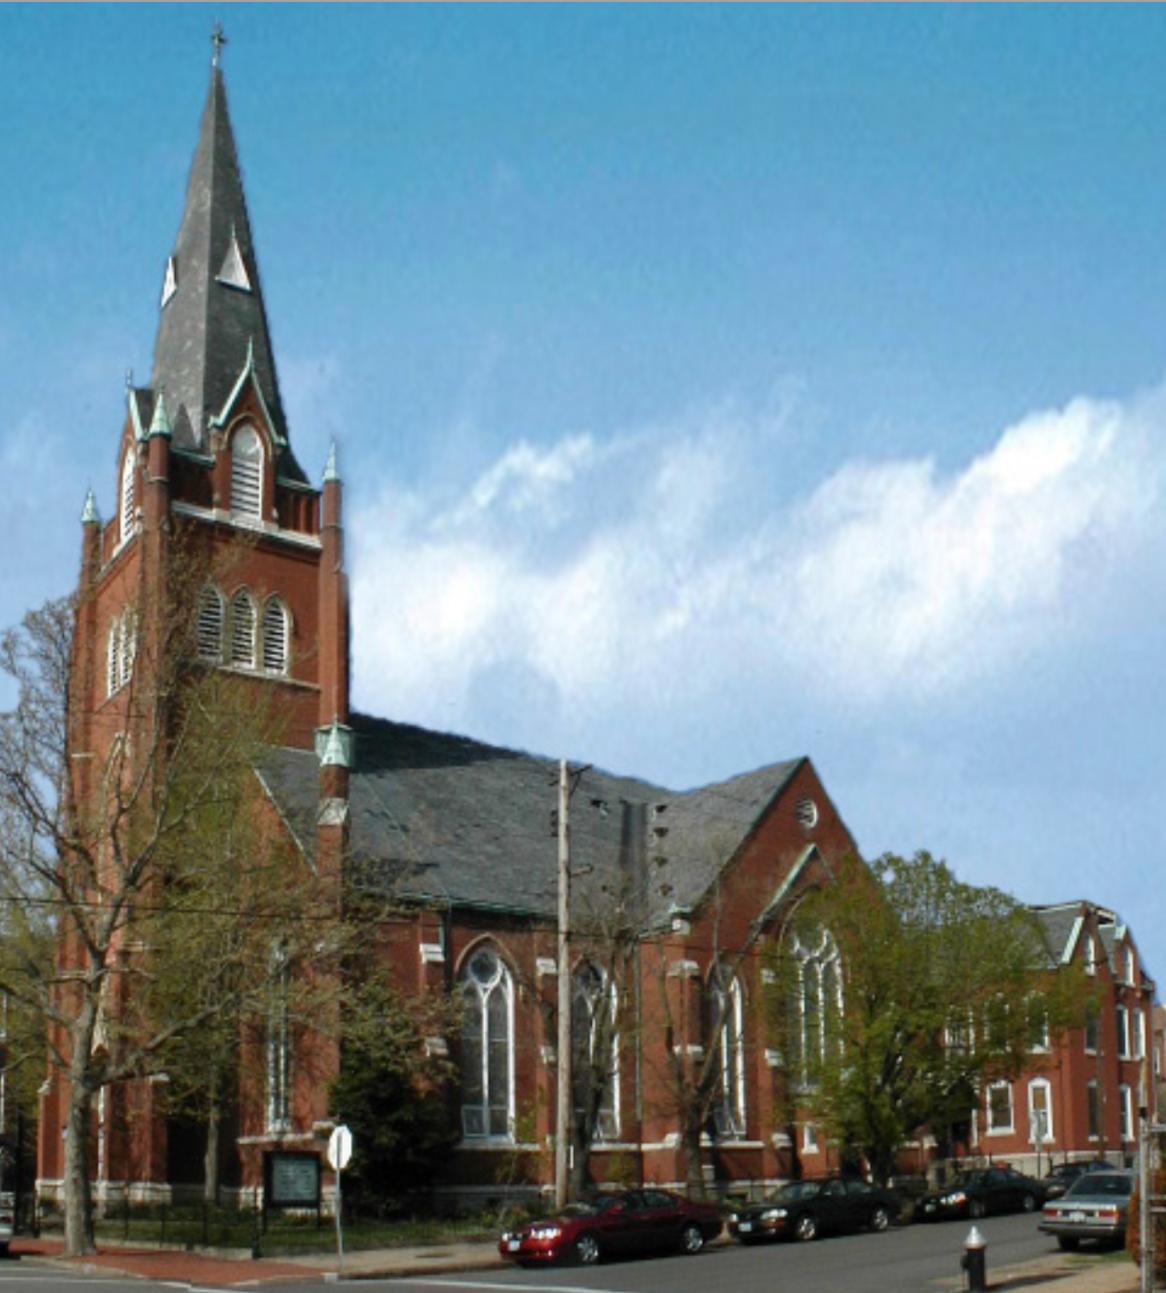 """Holy Trinity Lutheran Church on Soulard Street."" Photo by Ena Kovac, March 18, 2017."